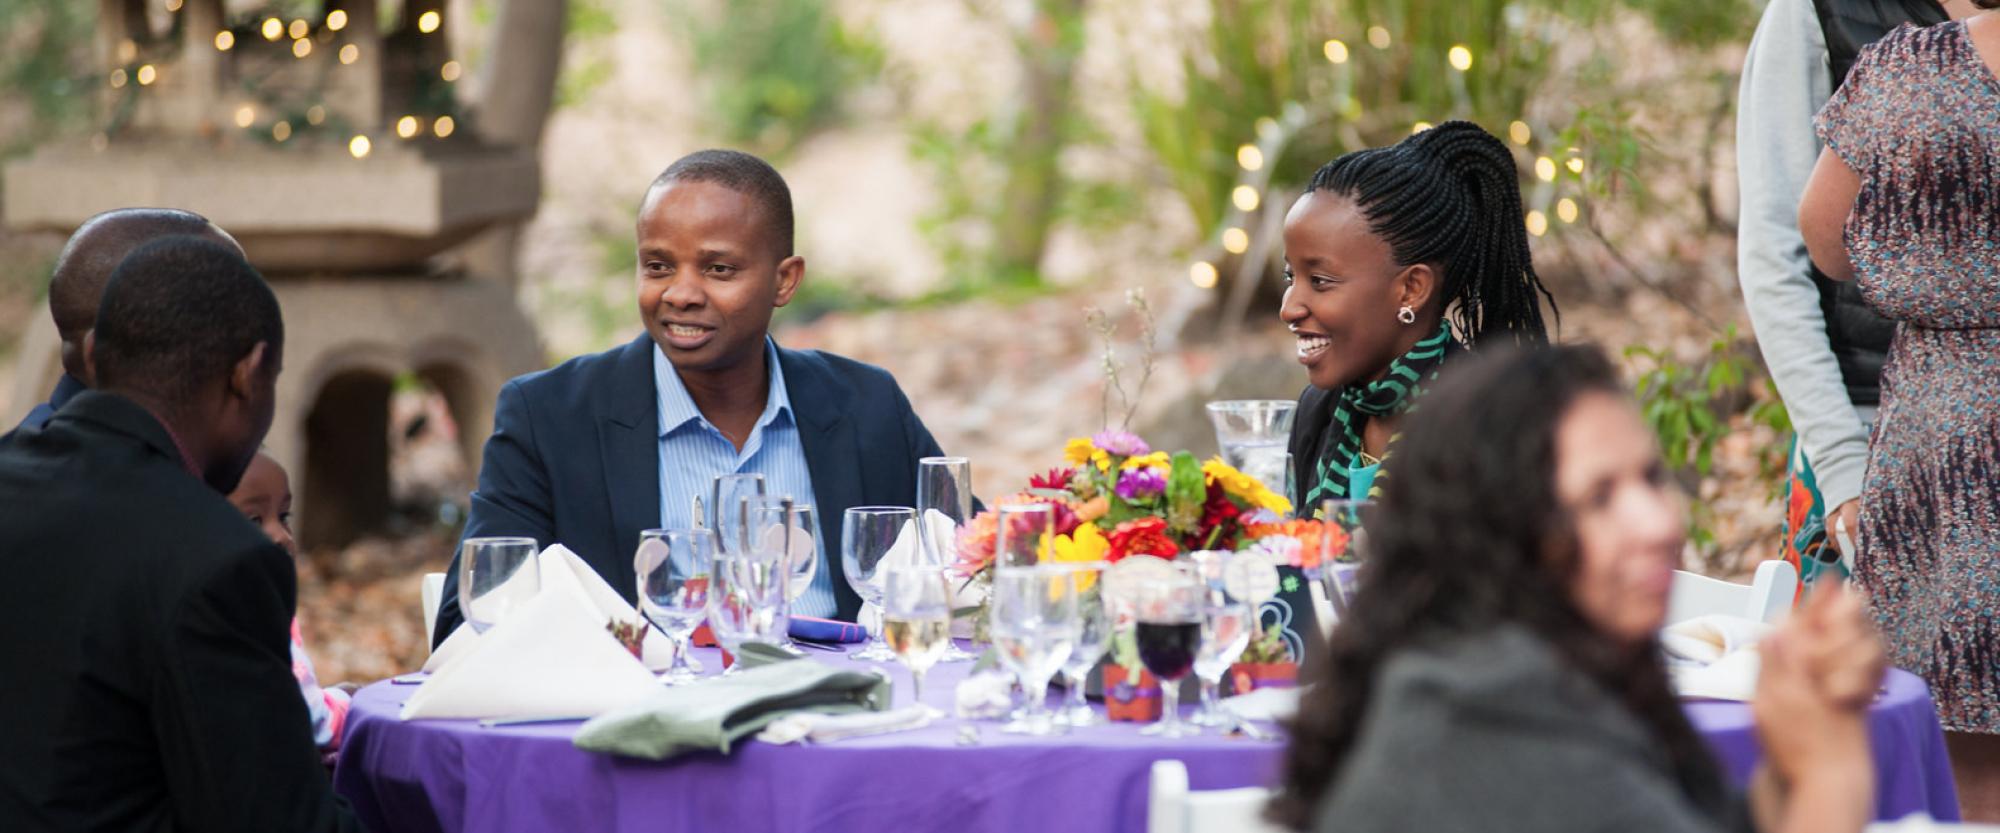 April 1, 2015 - 10:58am - AH_Weddings_rotator_slideshow6